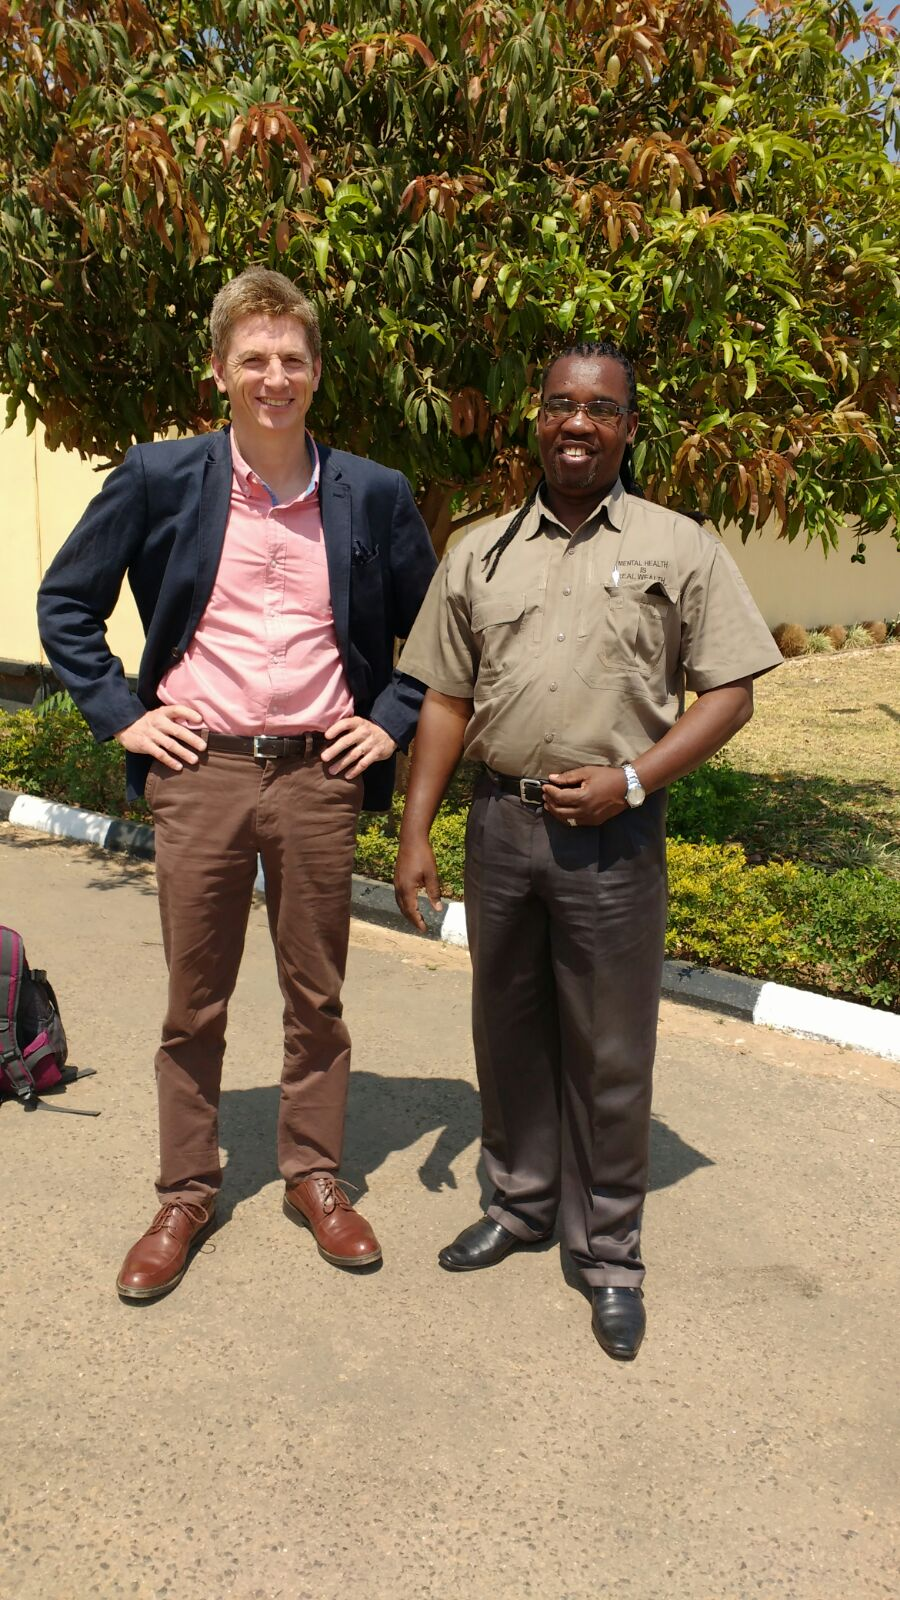 With Mr Hinson Siabwata at Chainama College of Health Sciences